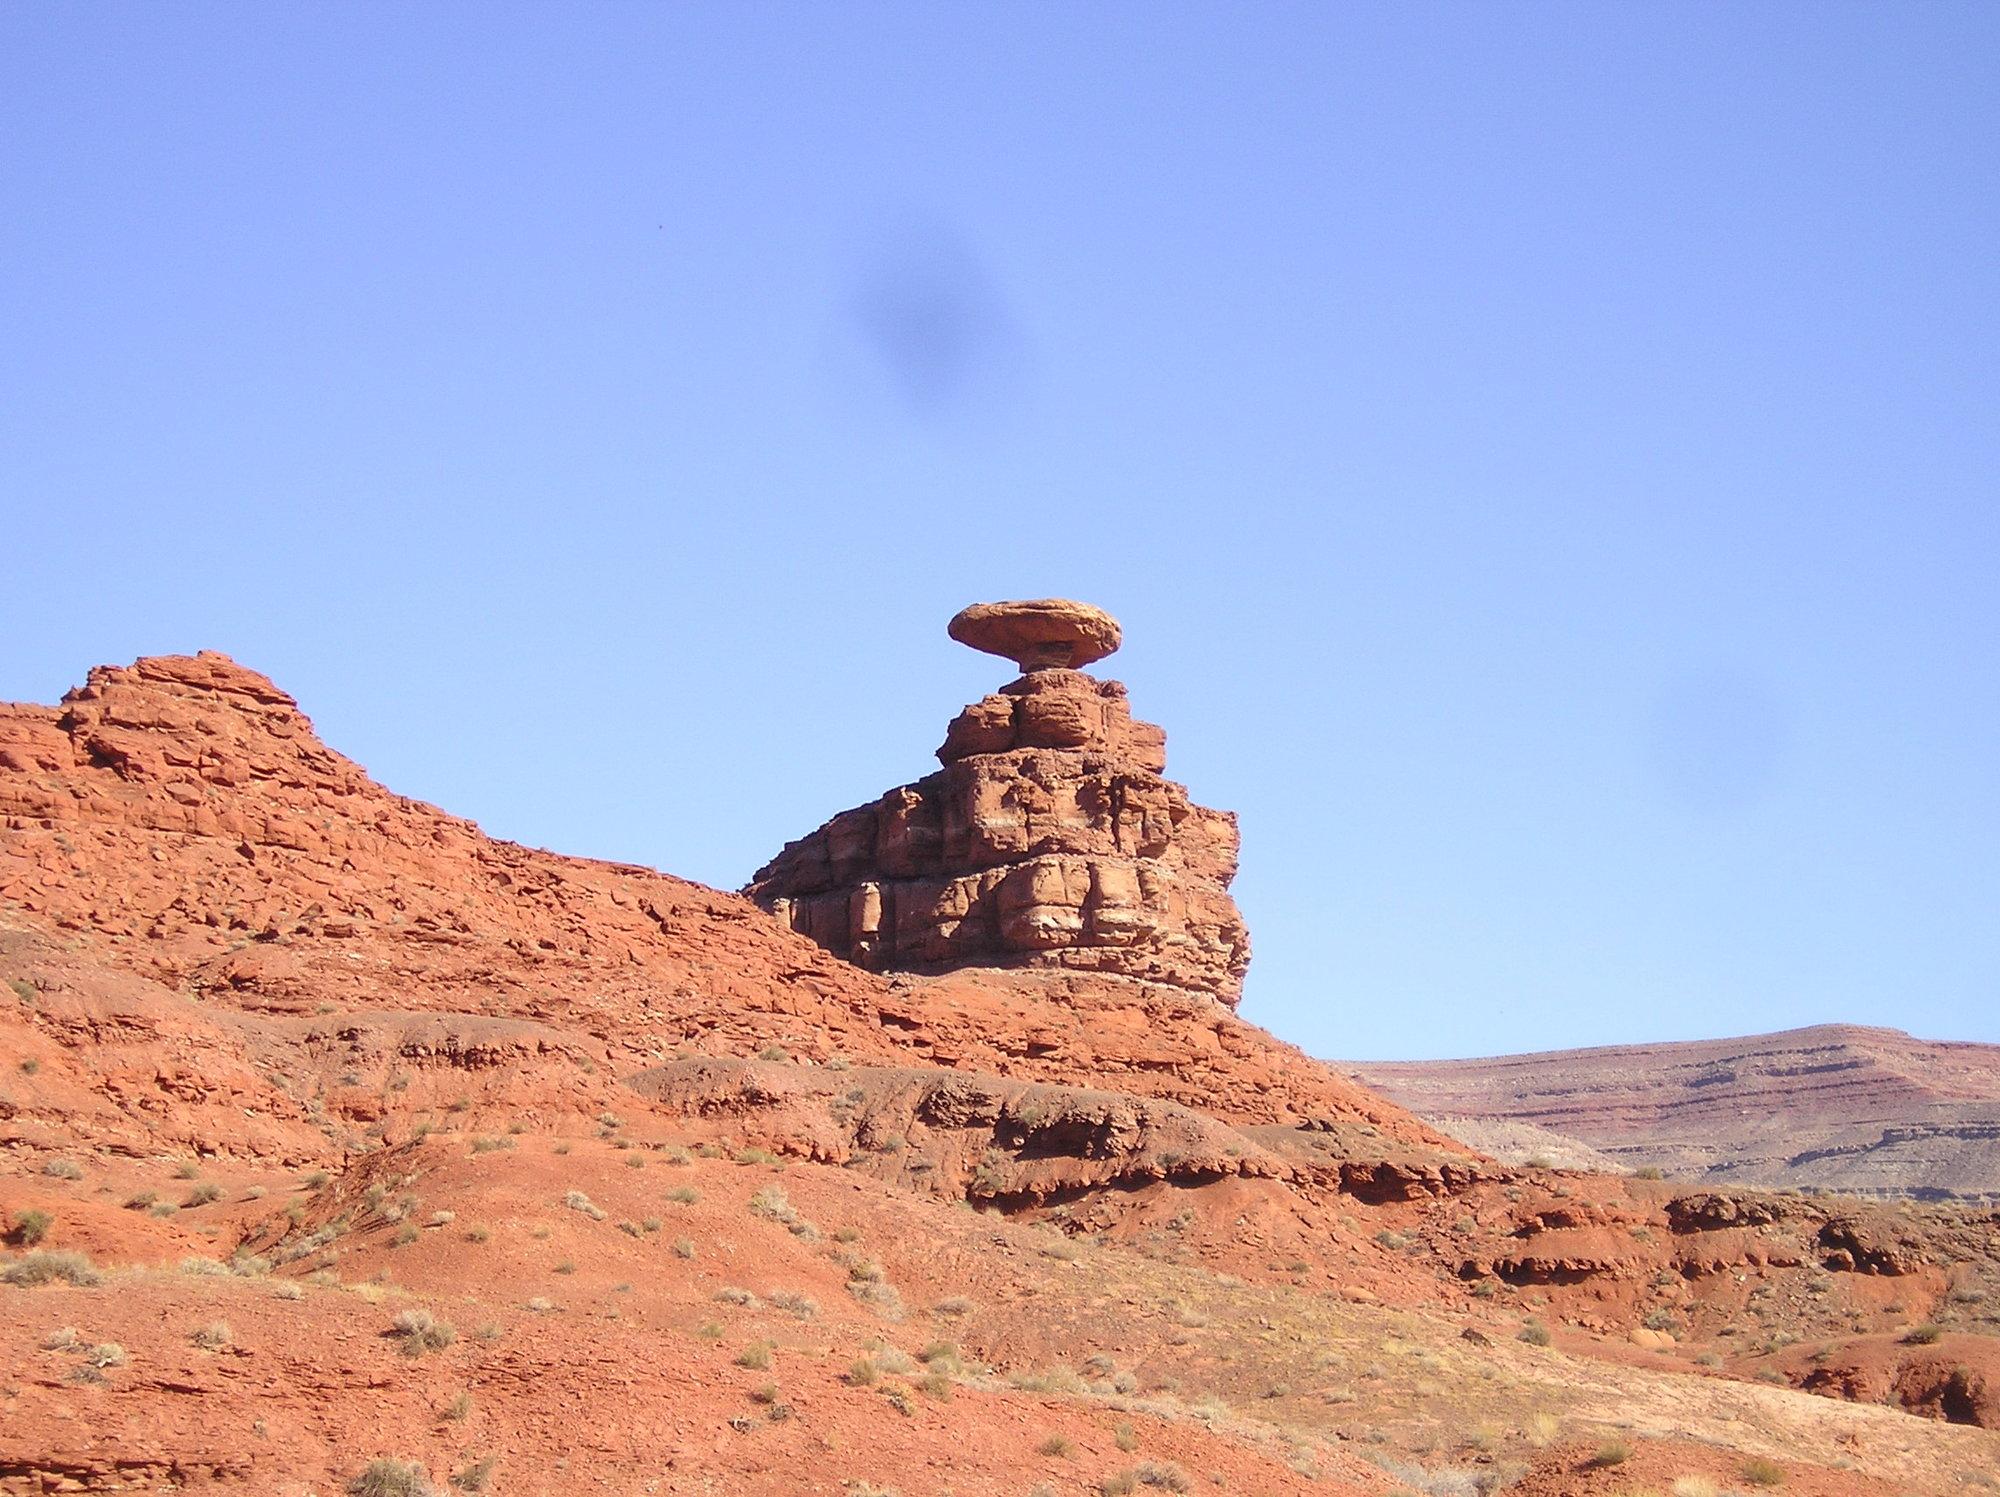 Moab Oct 2012 049.JPG